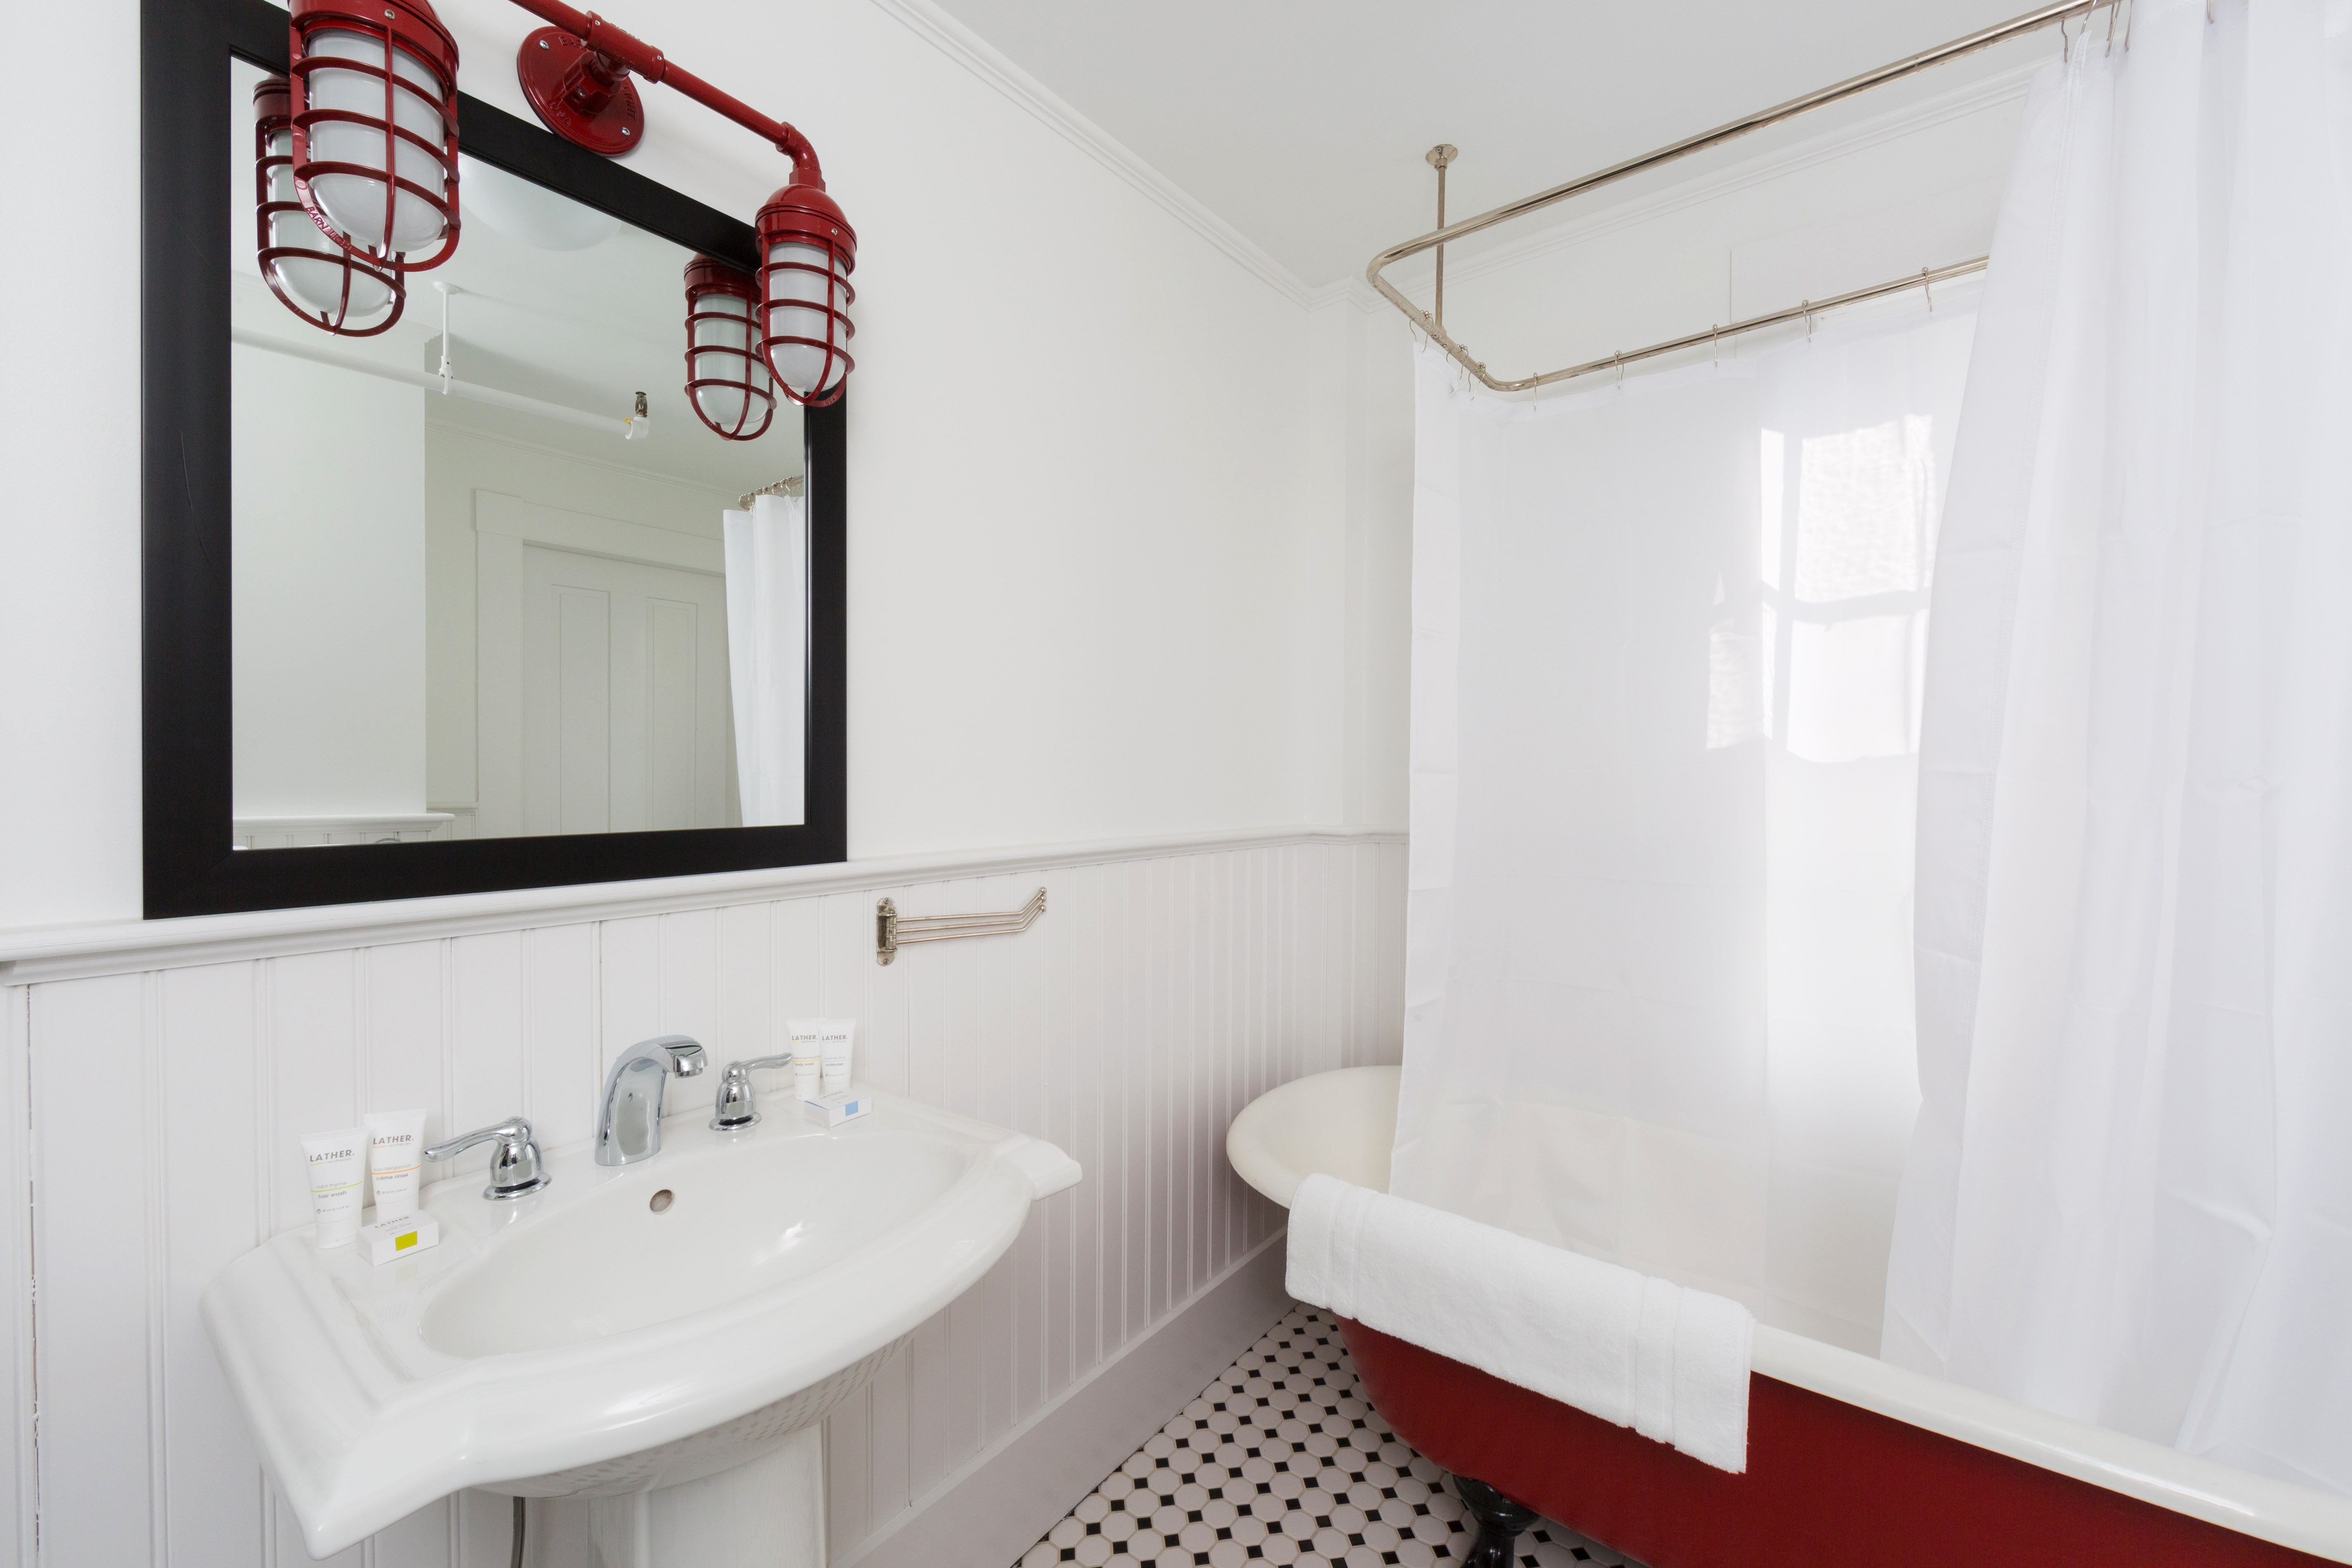 B&B Bath Boutique Budget bathroom property toilet white sink home cottage tile tub bathtub tiled